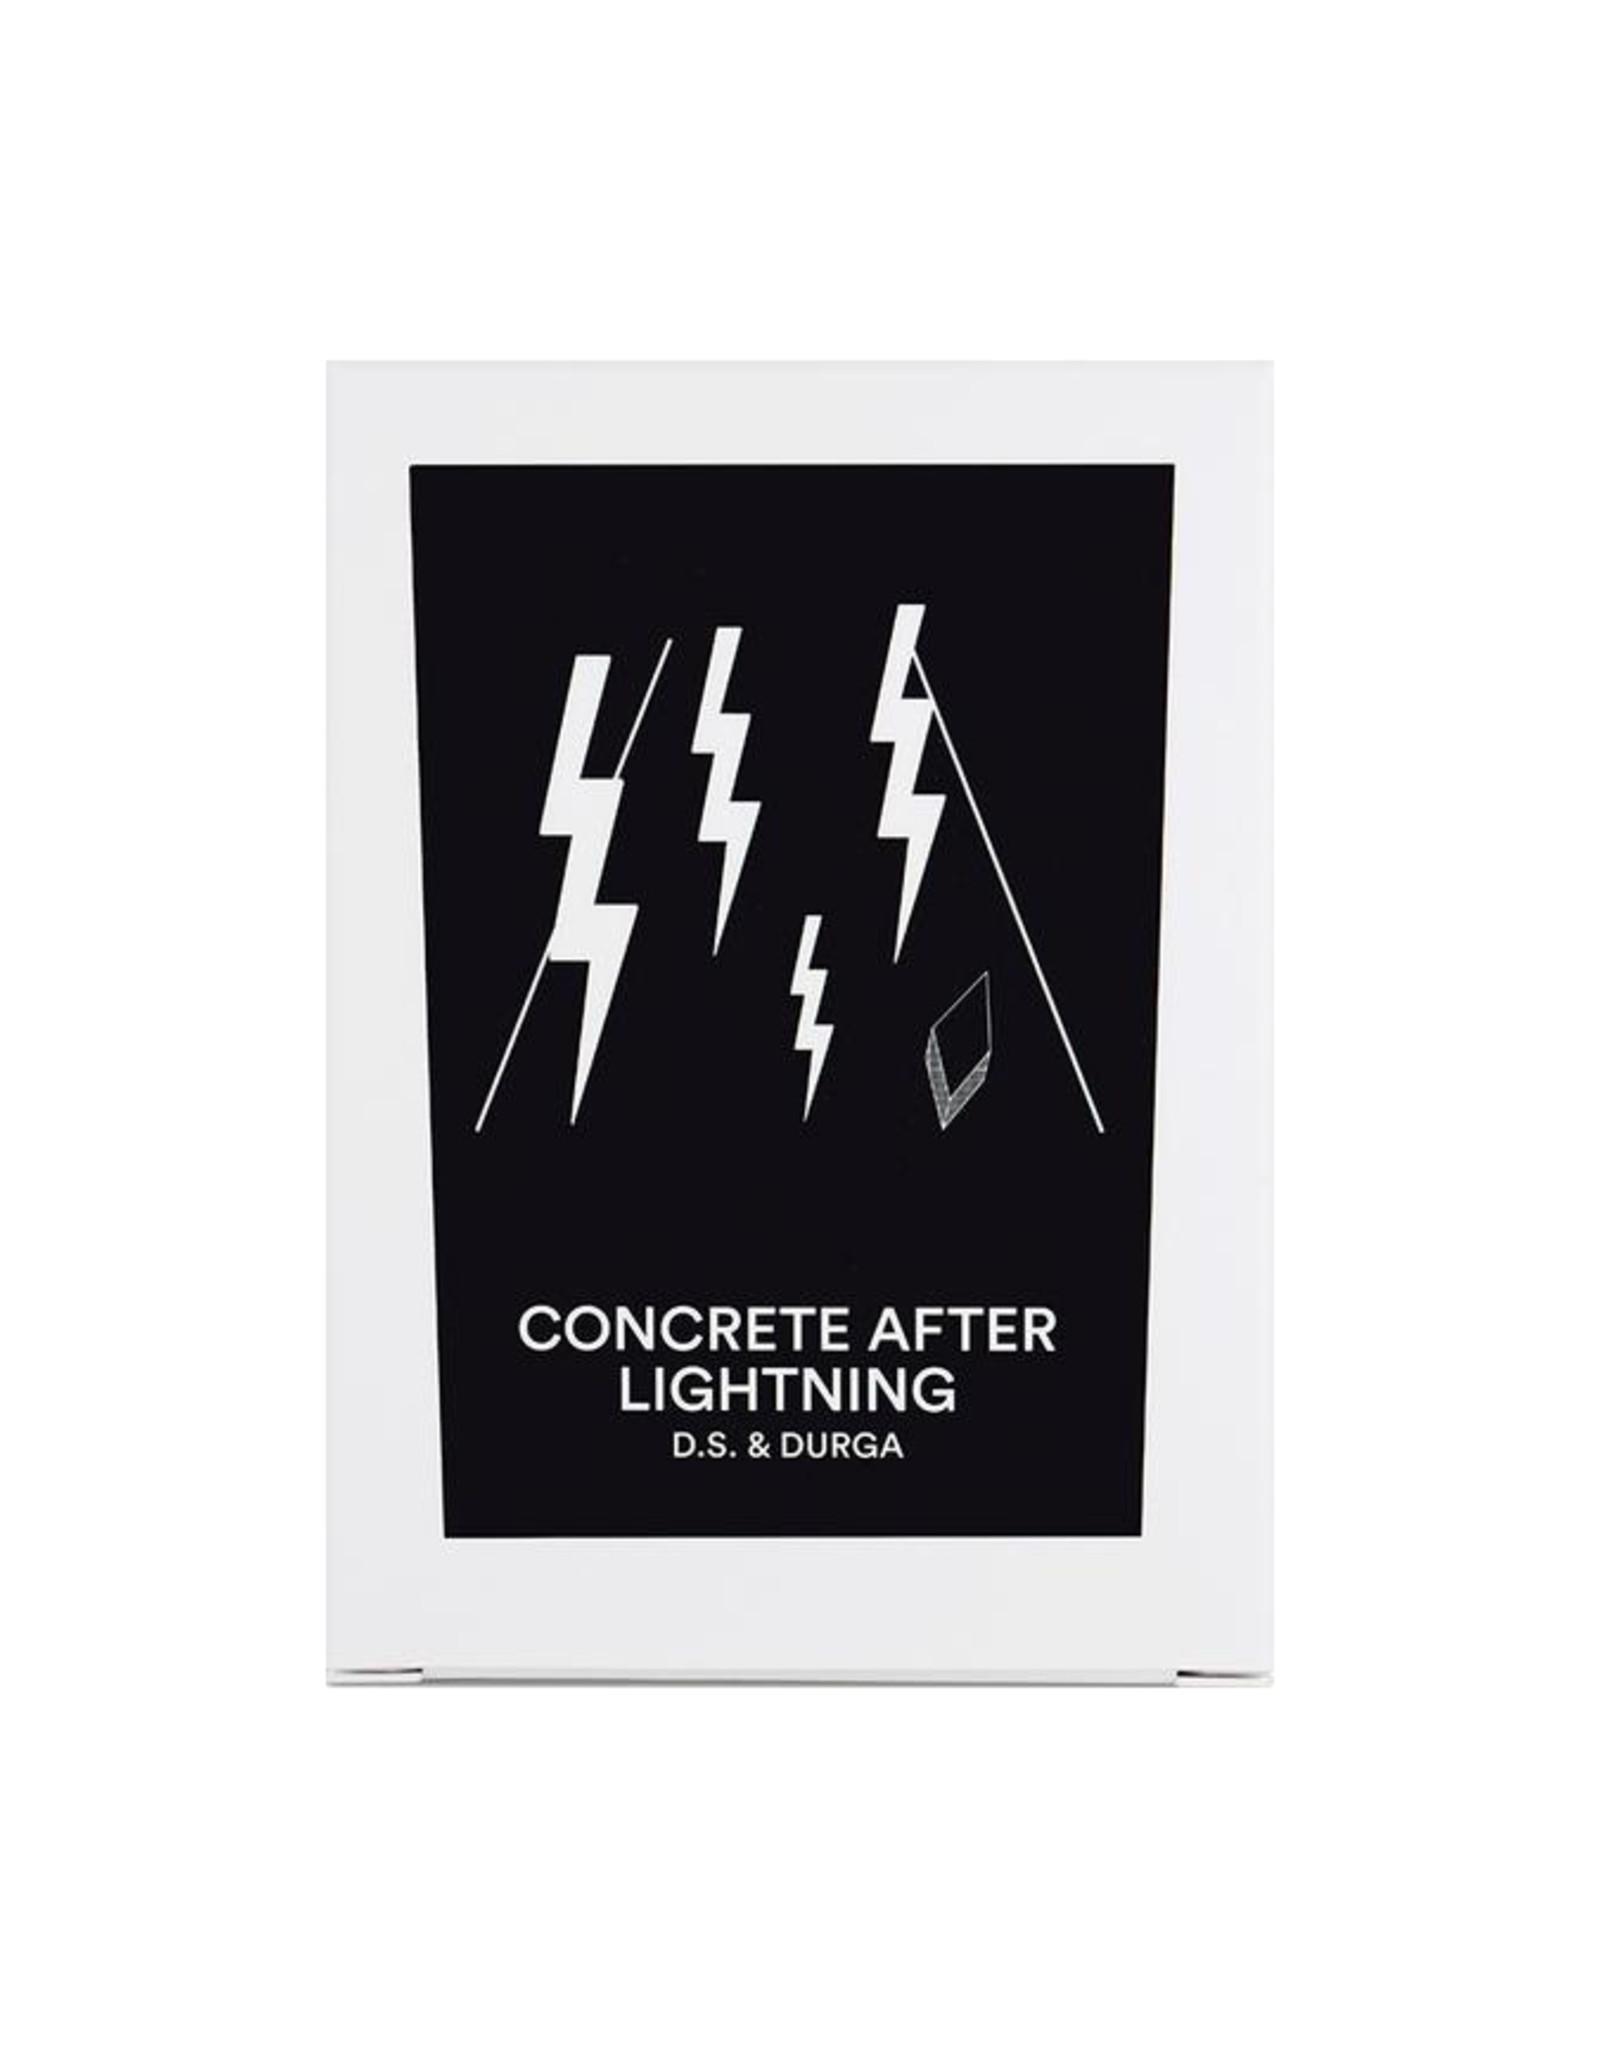 D.S. & DURGA Concrete After Lightning - Candle - 7oz.